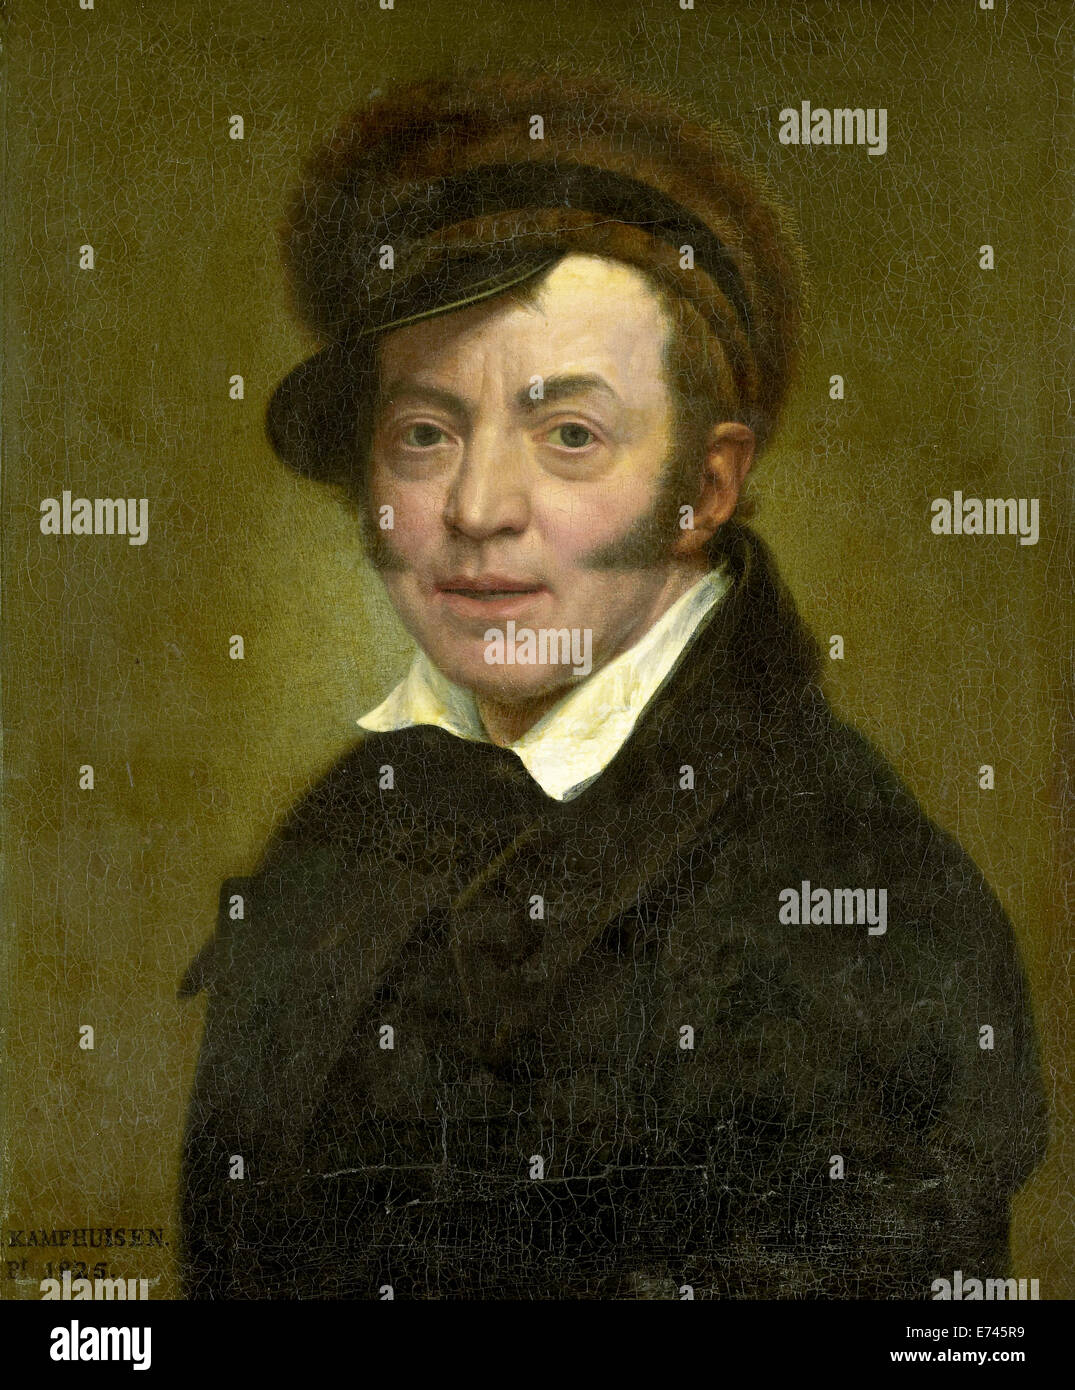 Self Portrait - by Jan Kamphuysen, 1825 - Stock Image